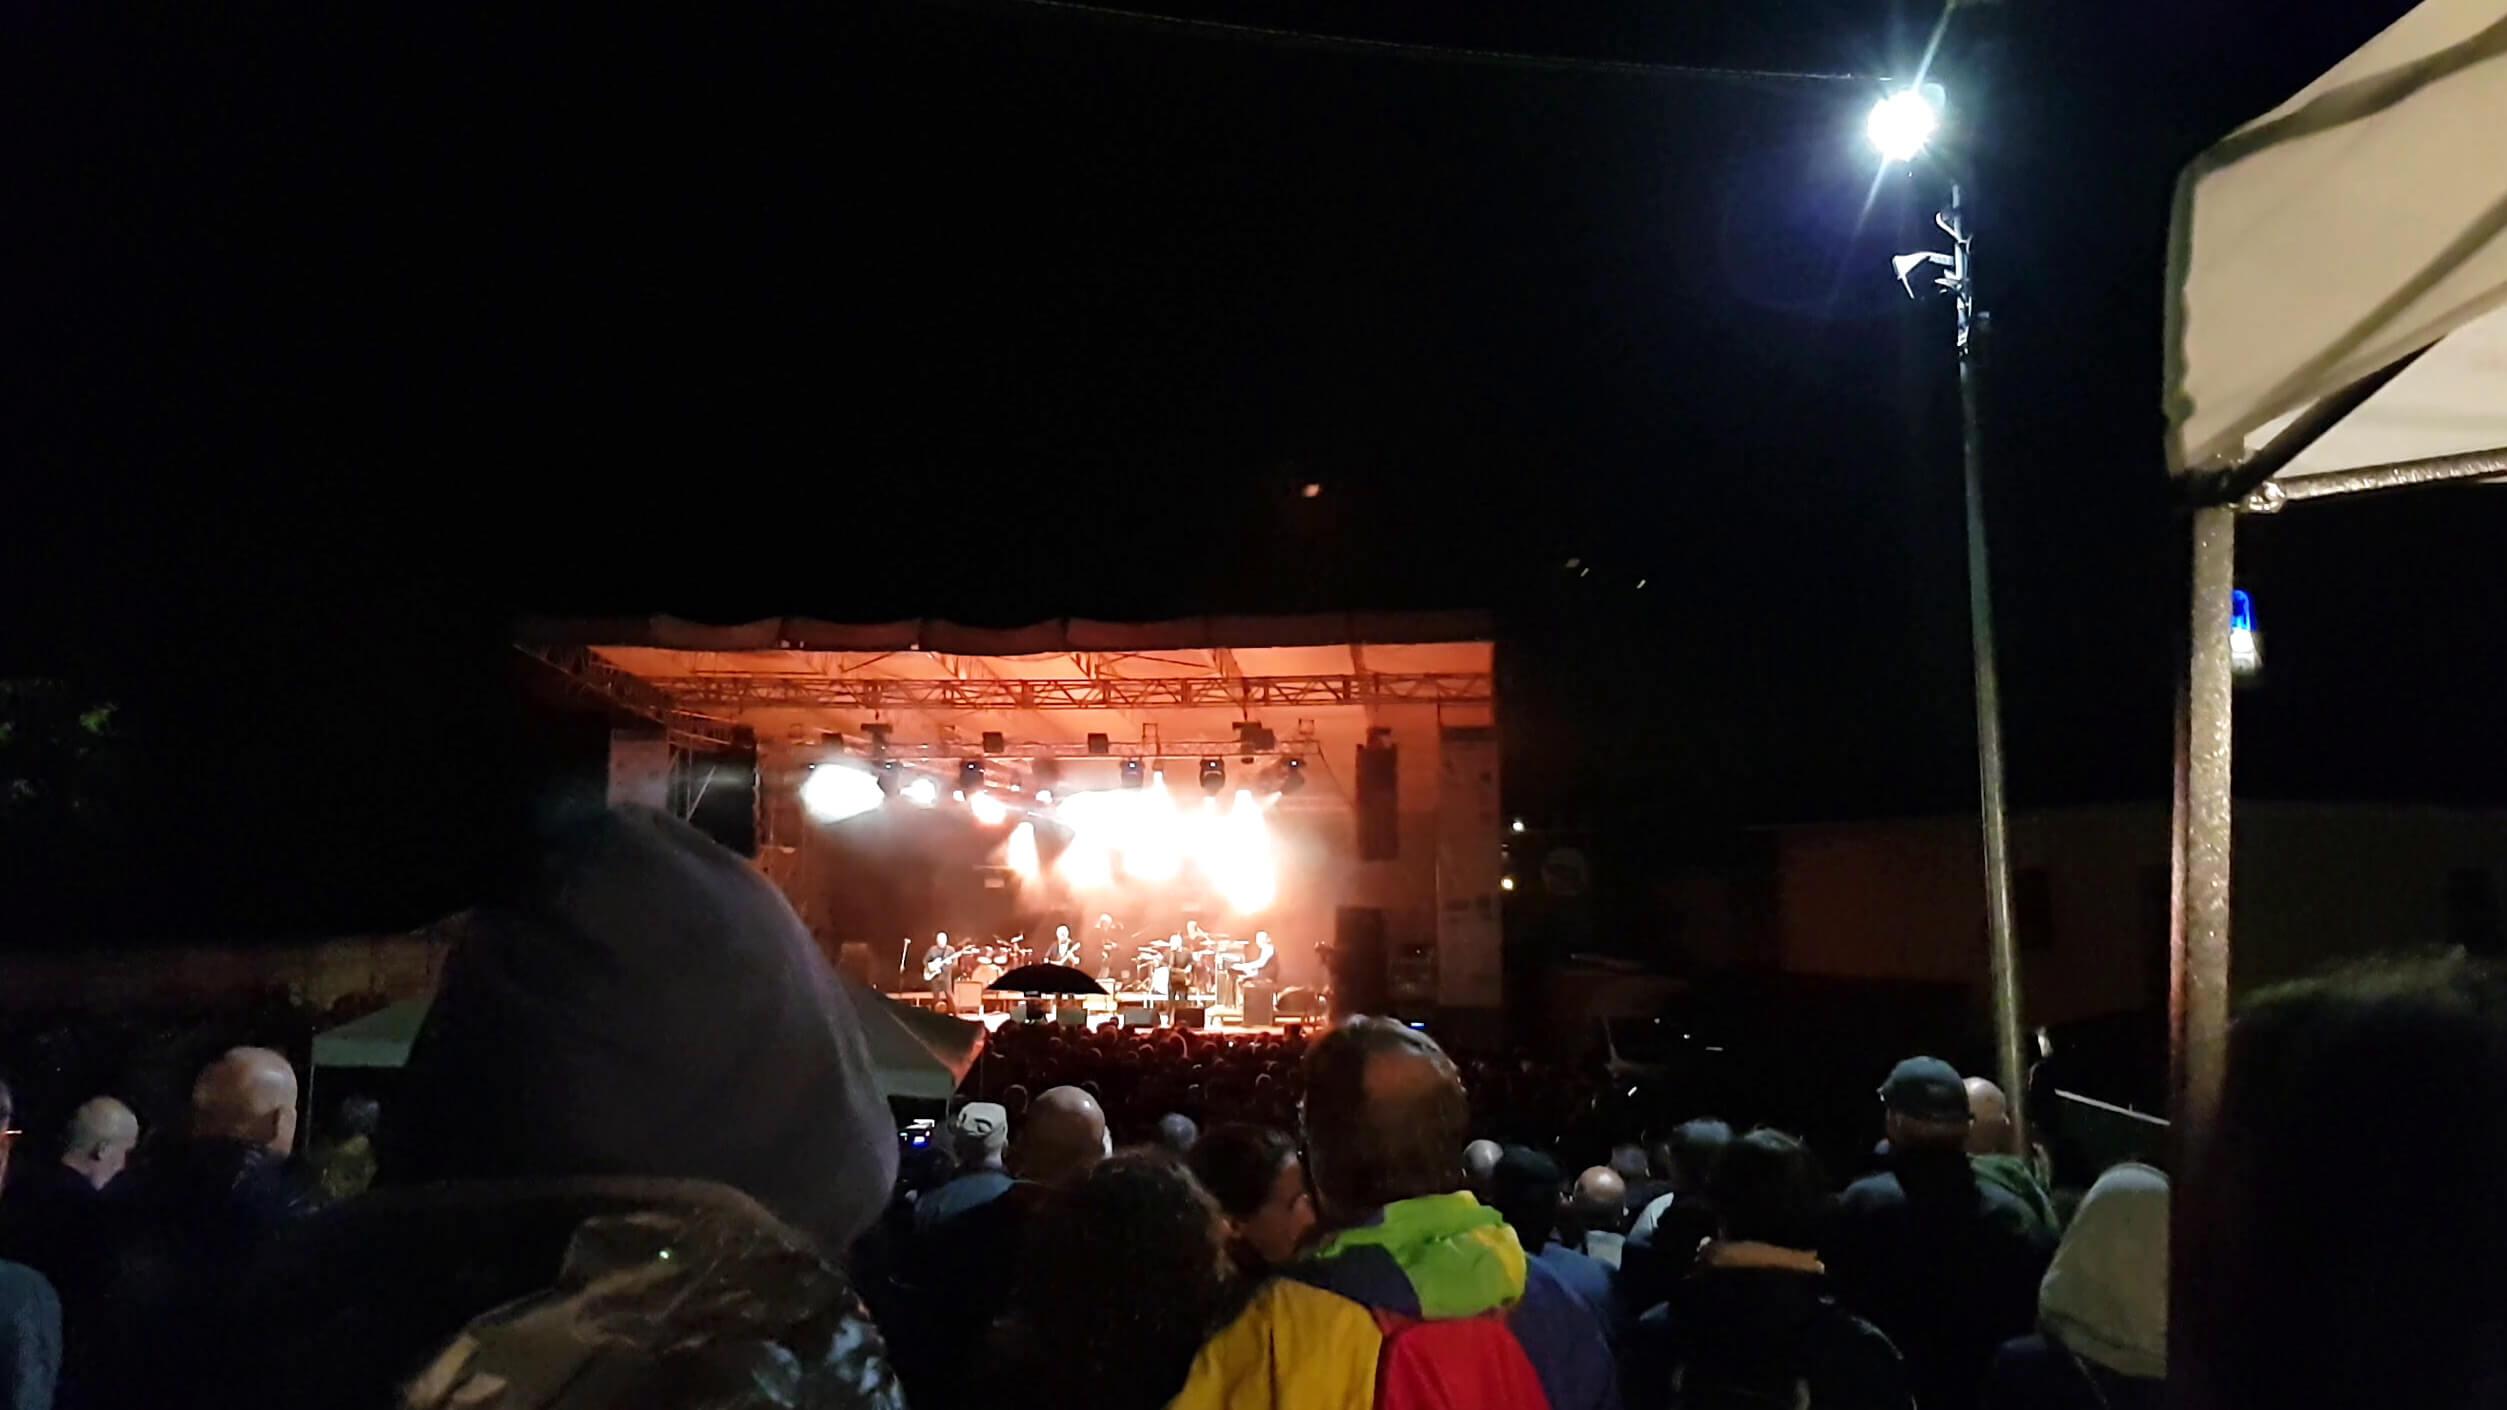 2Days Prog + 1 Festival Olivia Hadjiioannou, Oh. Metallia Veruno Italy